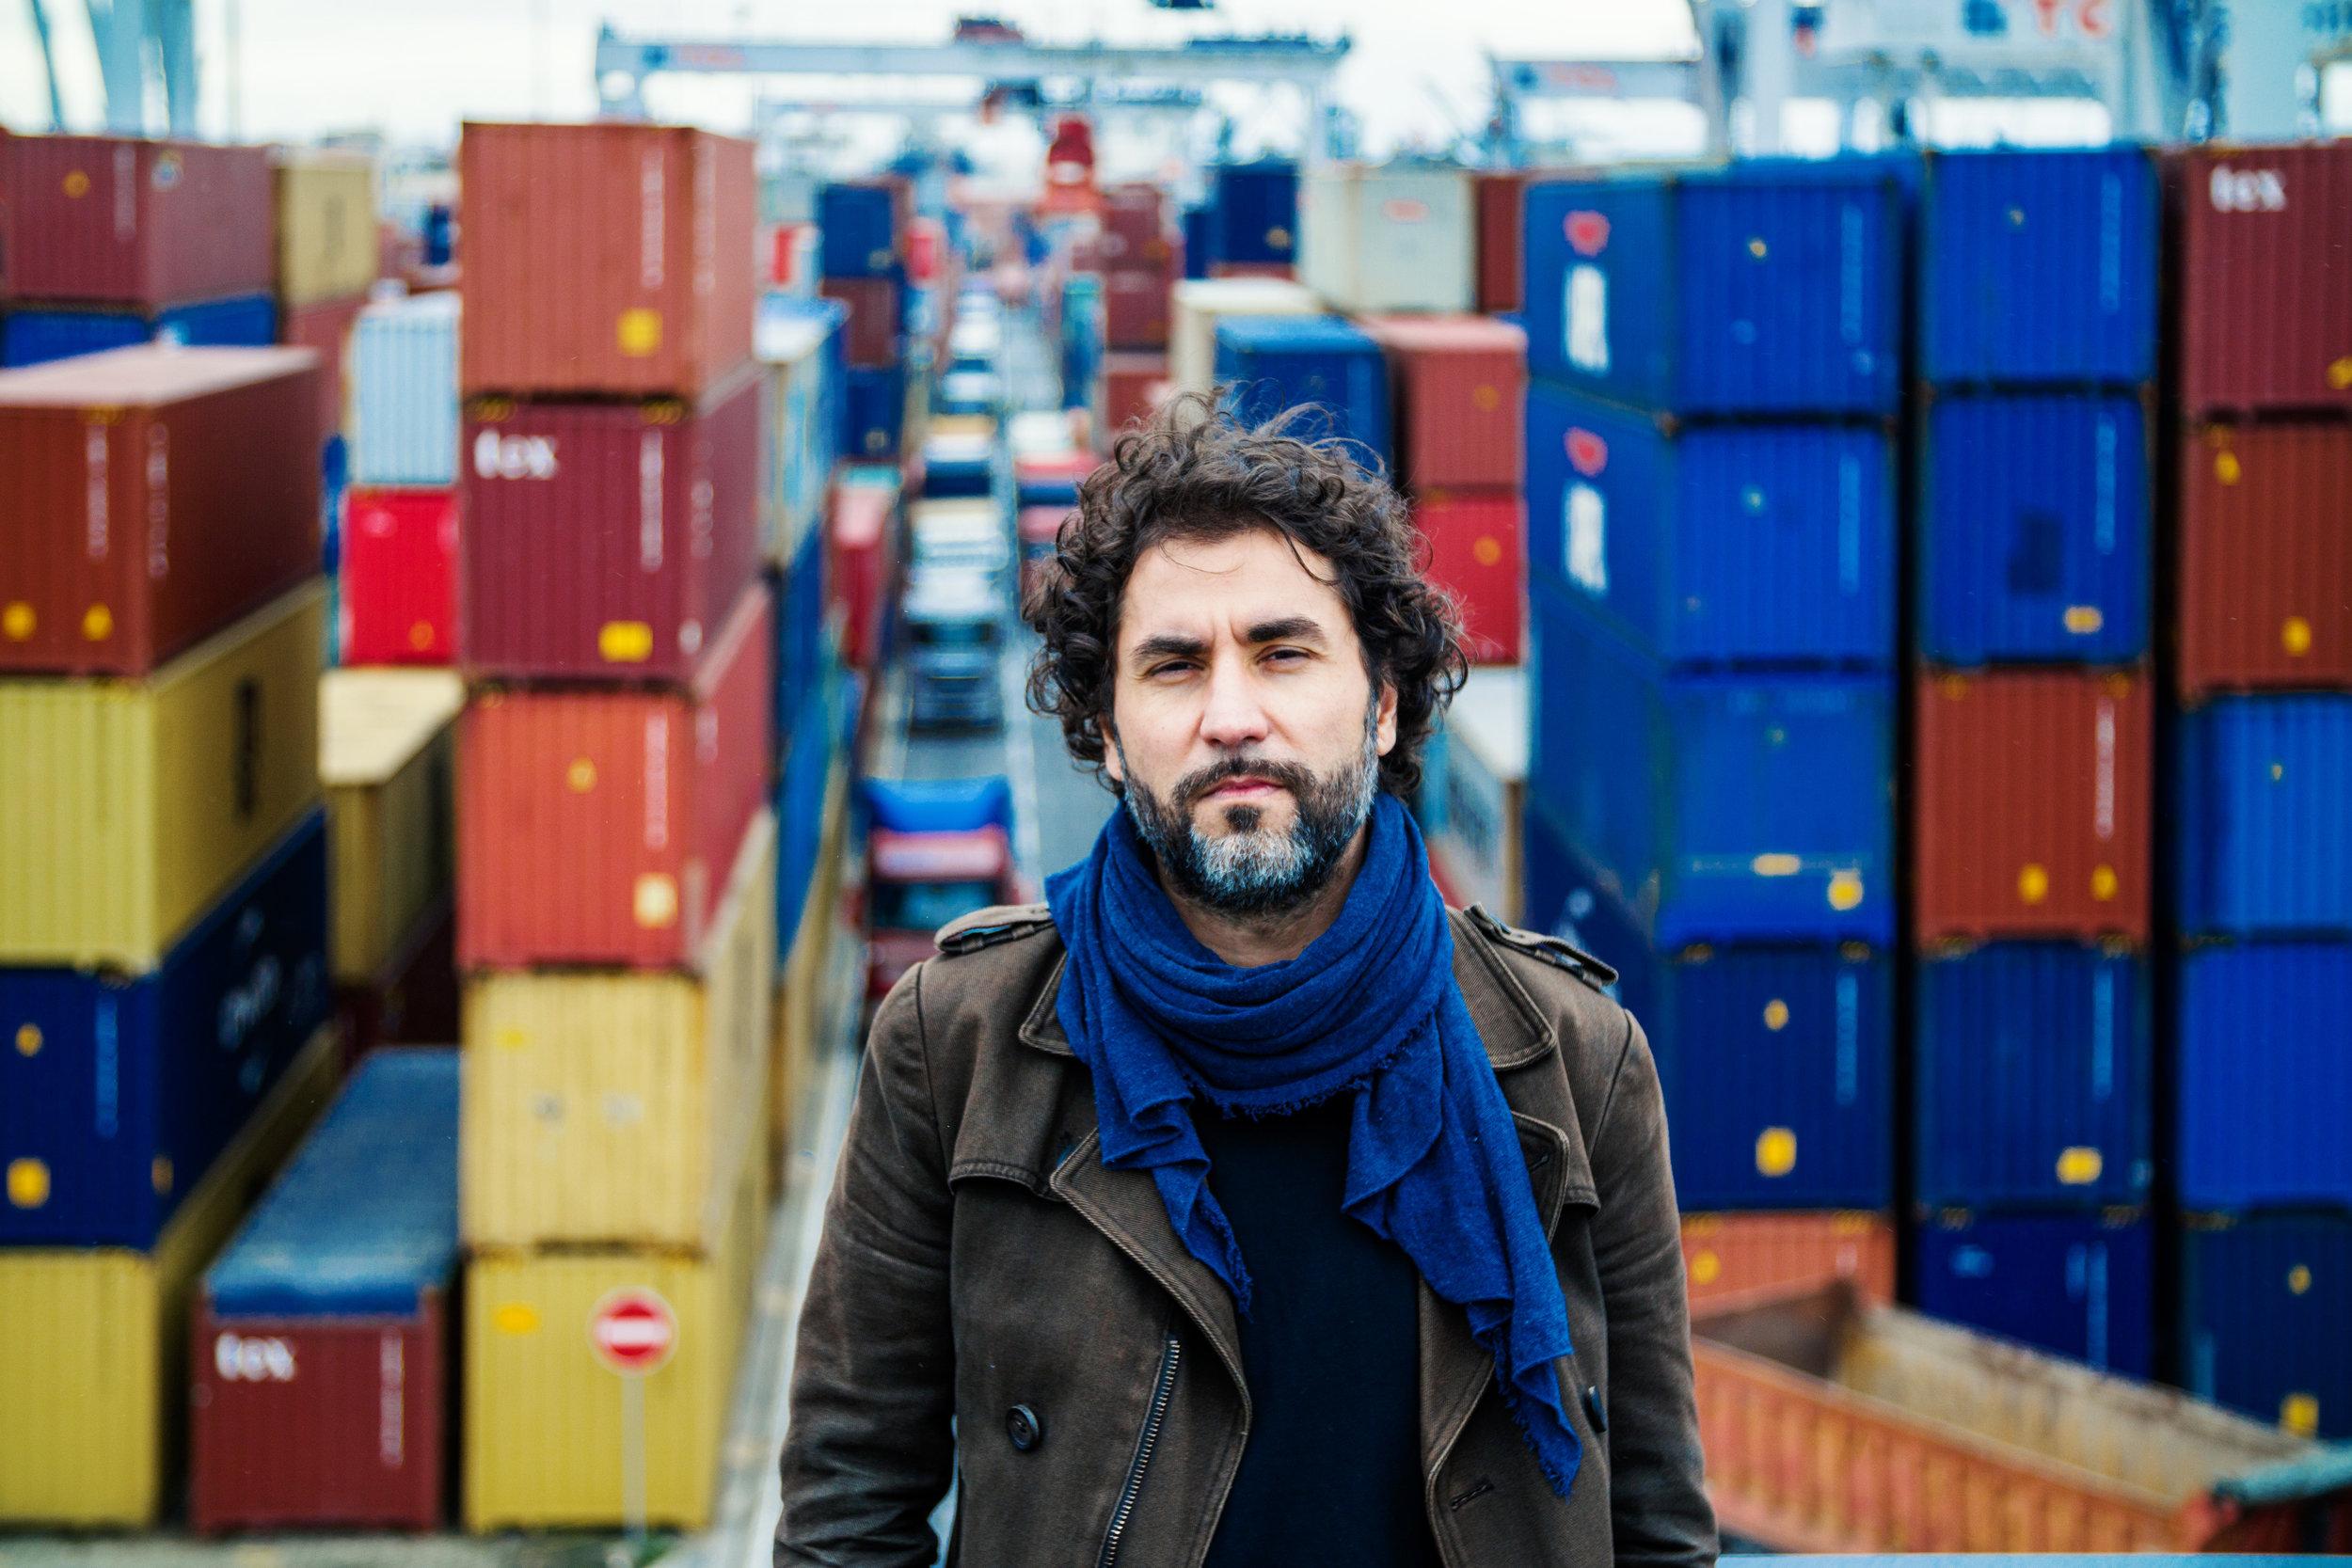 Retratos Luís Bittencourt_A6307574.jpg